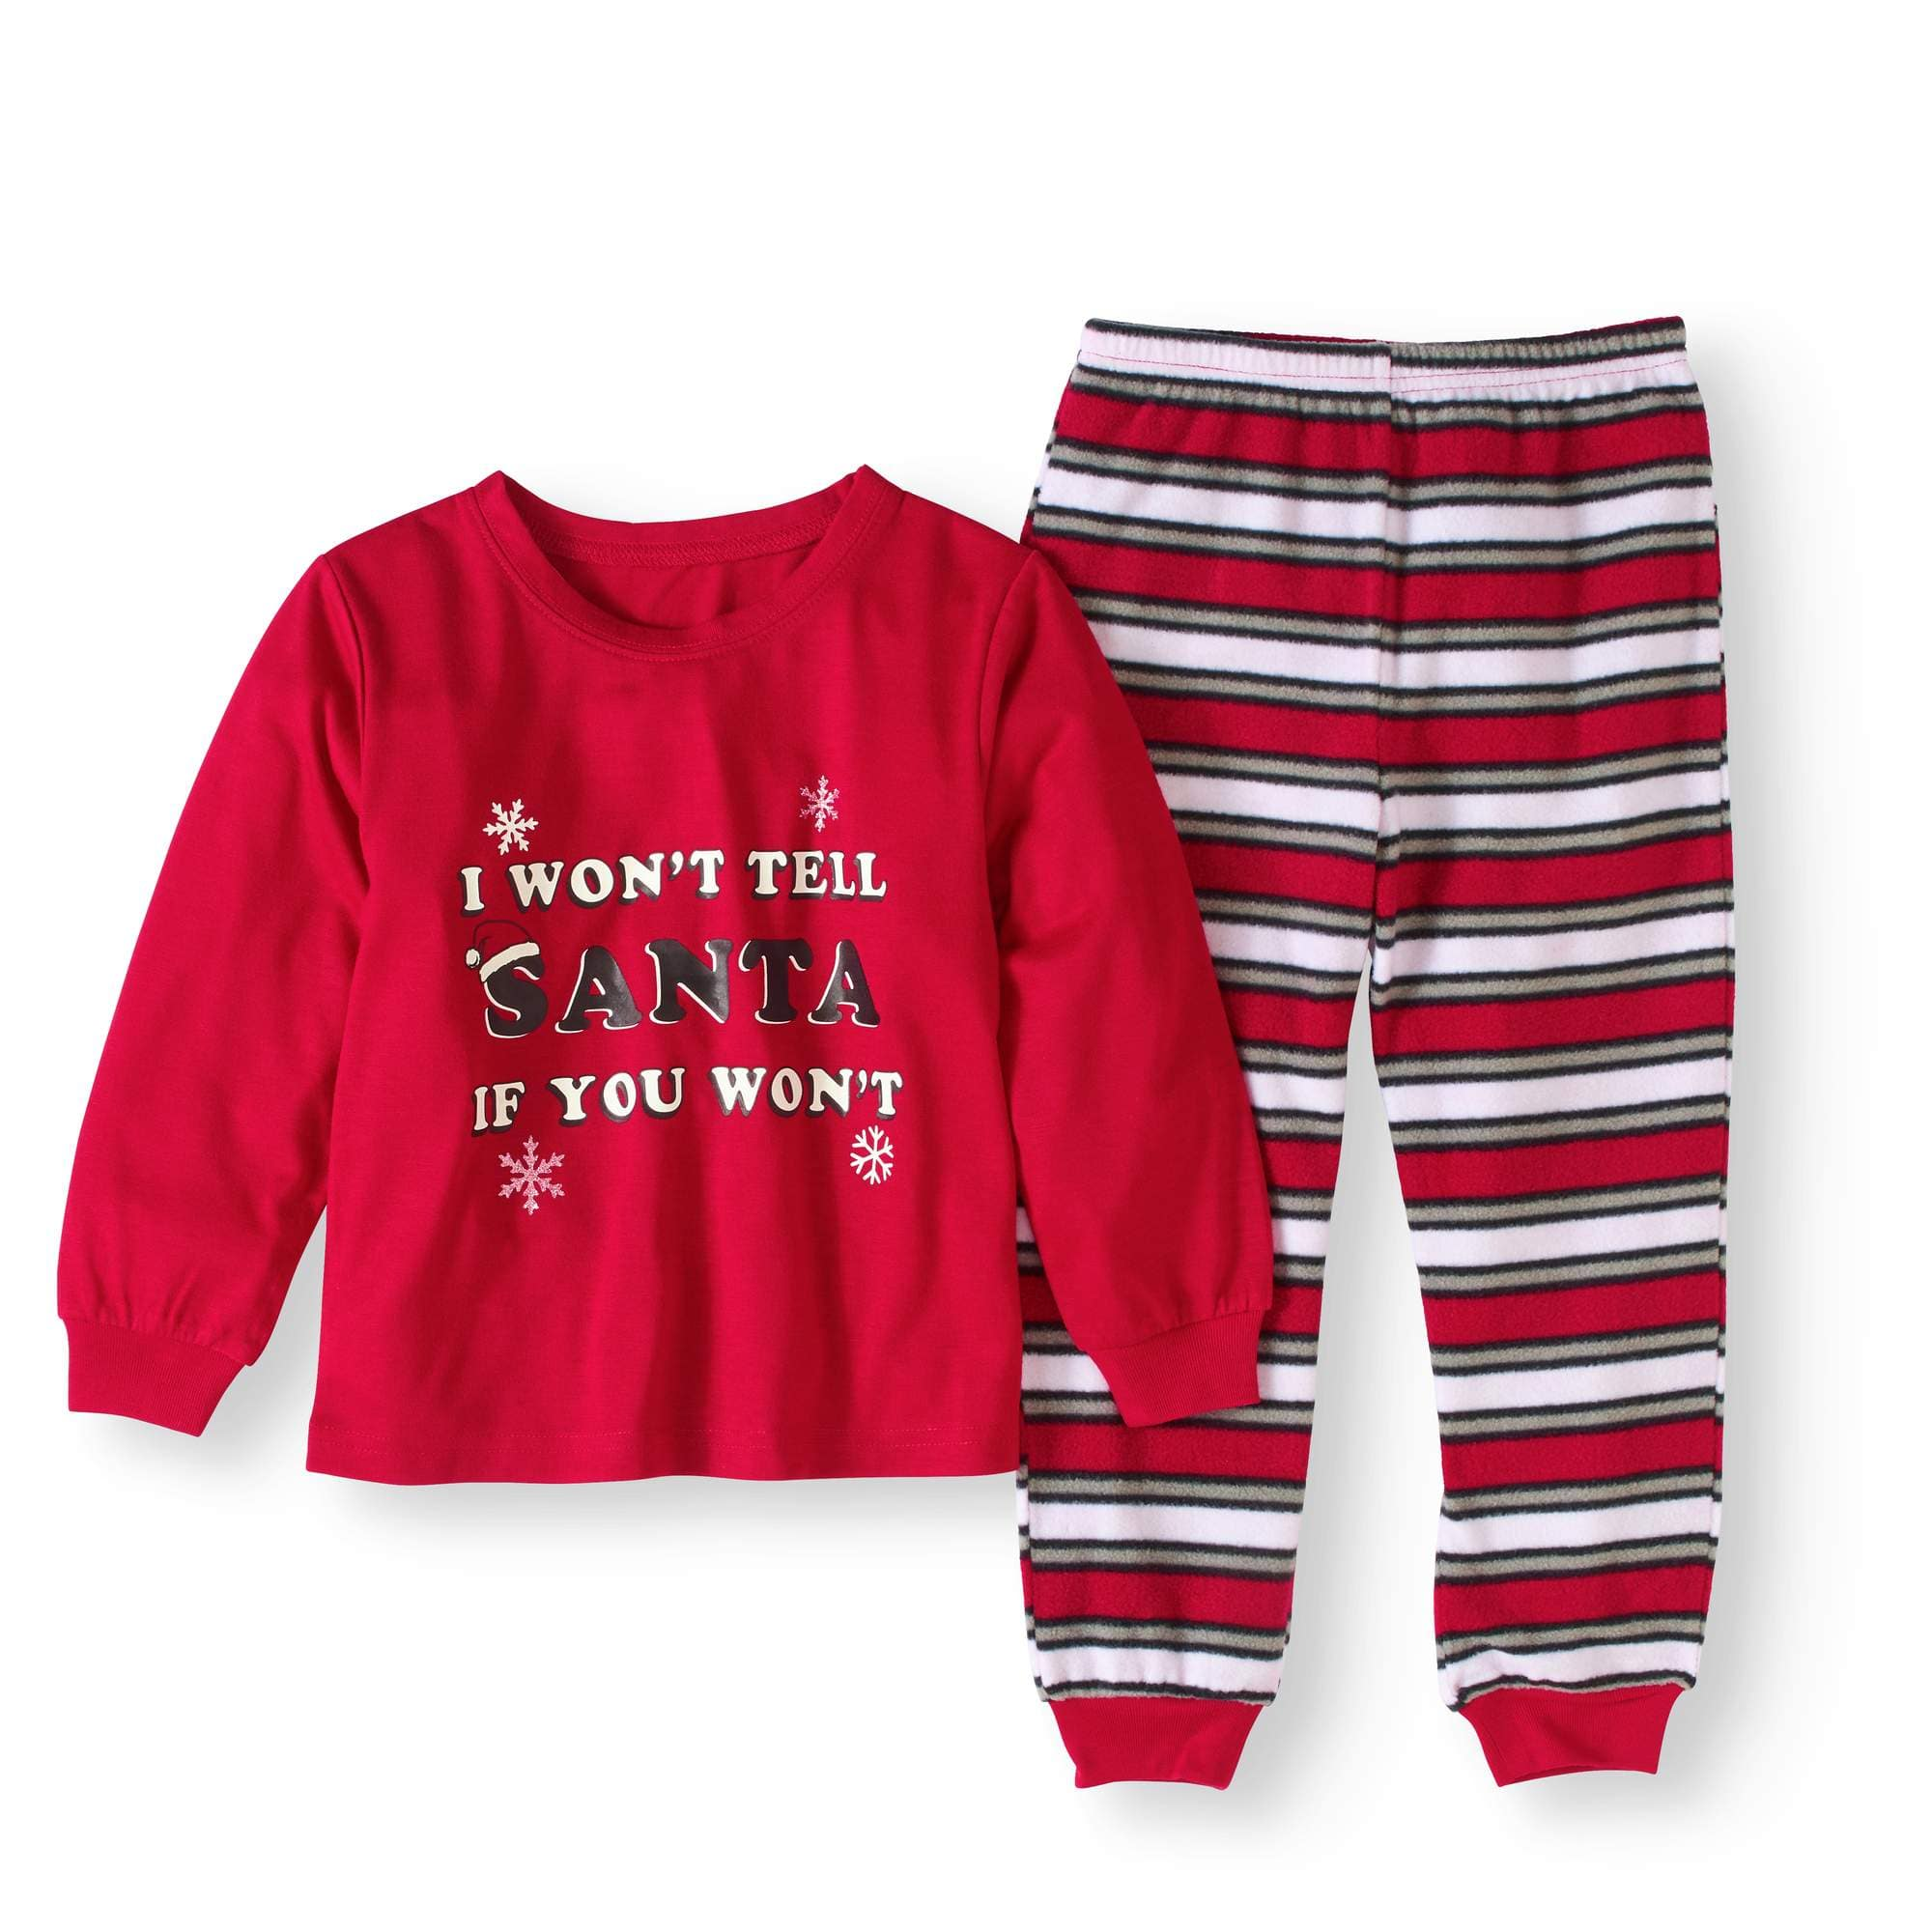 e25e99b368 2-Piece Baby Toddler Unisex Holiday Naughty or Nice Pajama Set ...